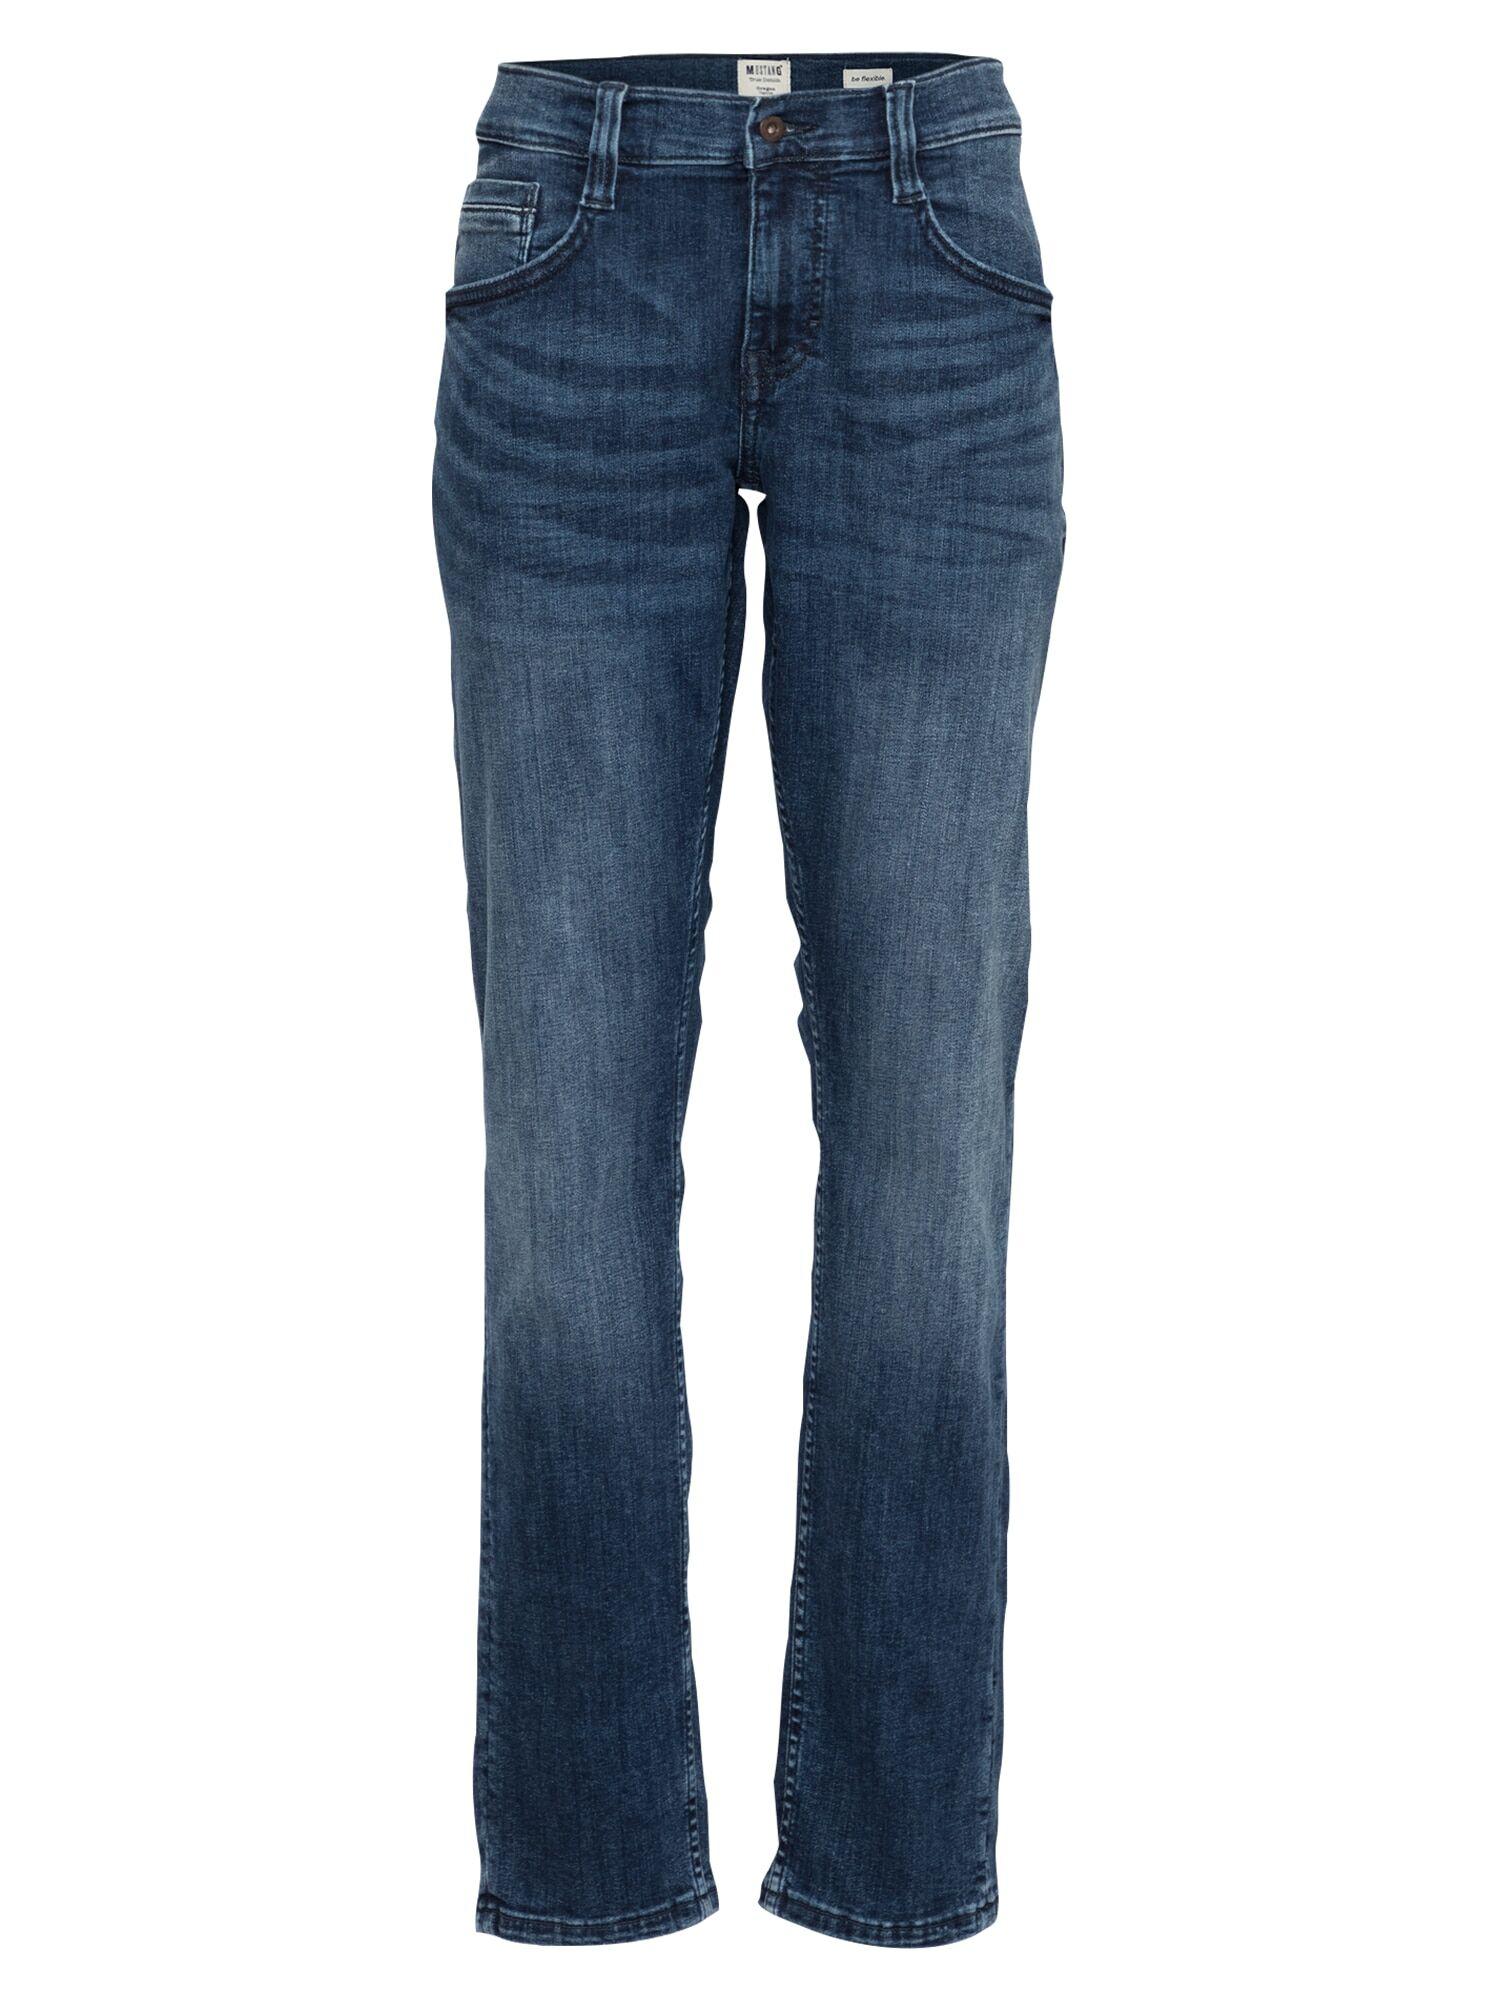 MUSTANG Jean 'Oregon'  - Bleu - Taille: 31/30 - male